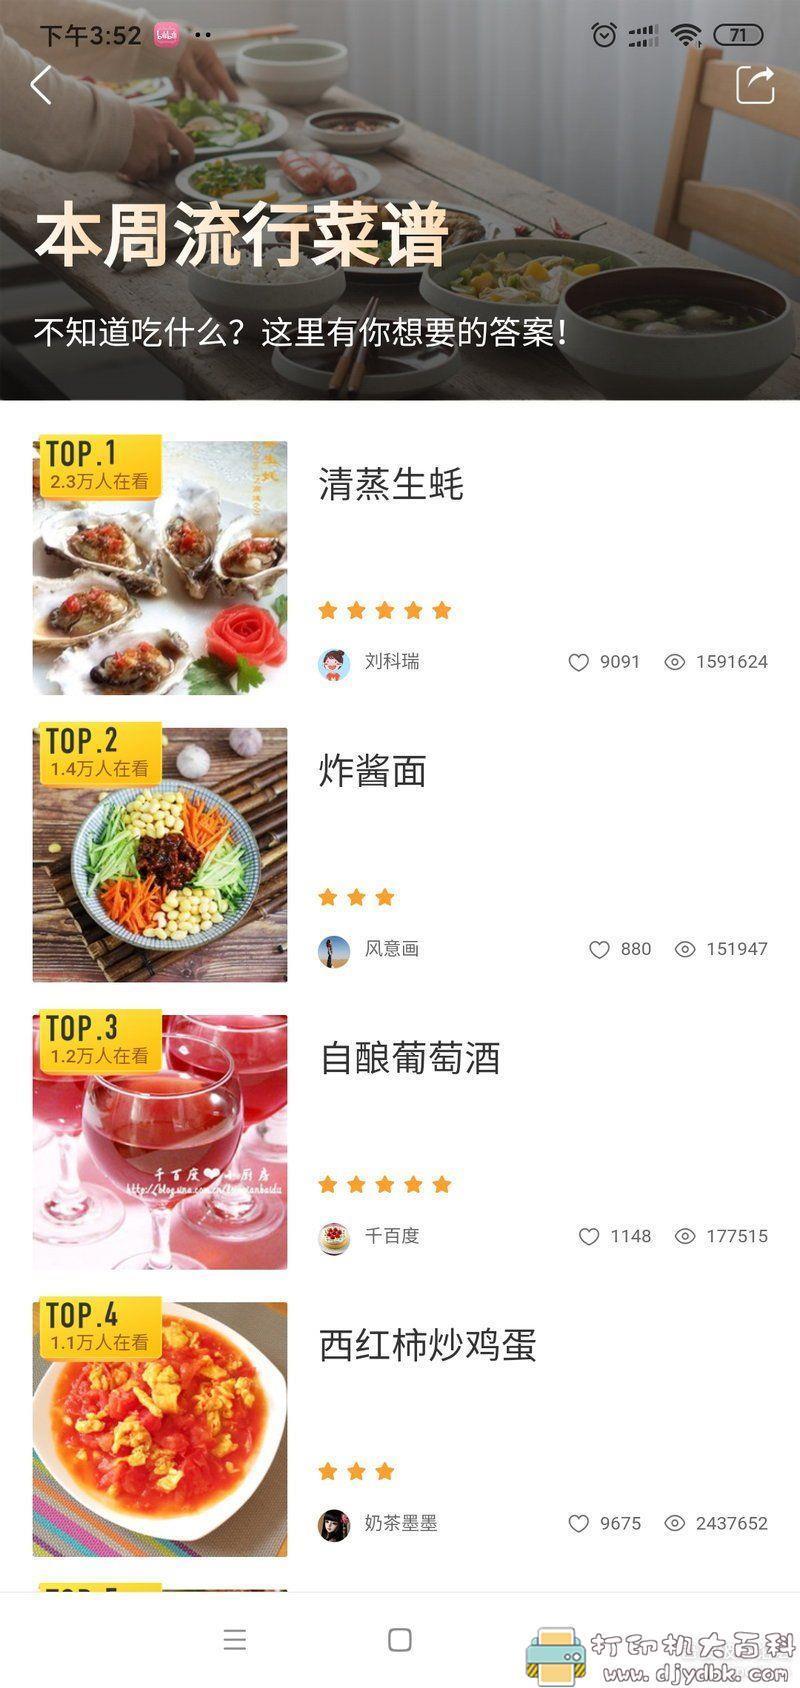 [Android]菜谱软件-美食杰 v7.2.2 去广告版 配图 No.1